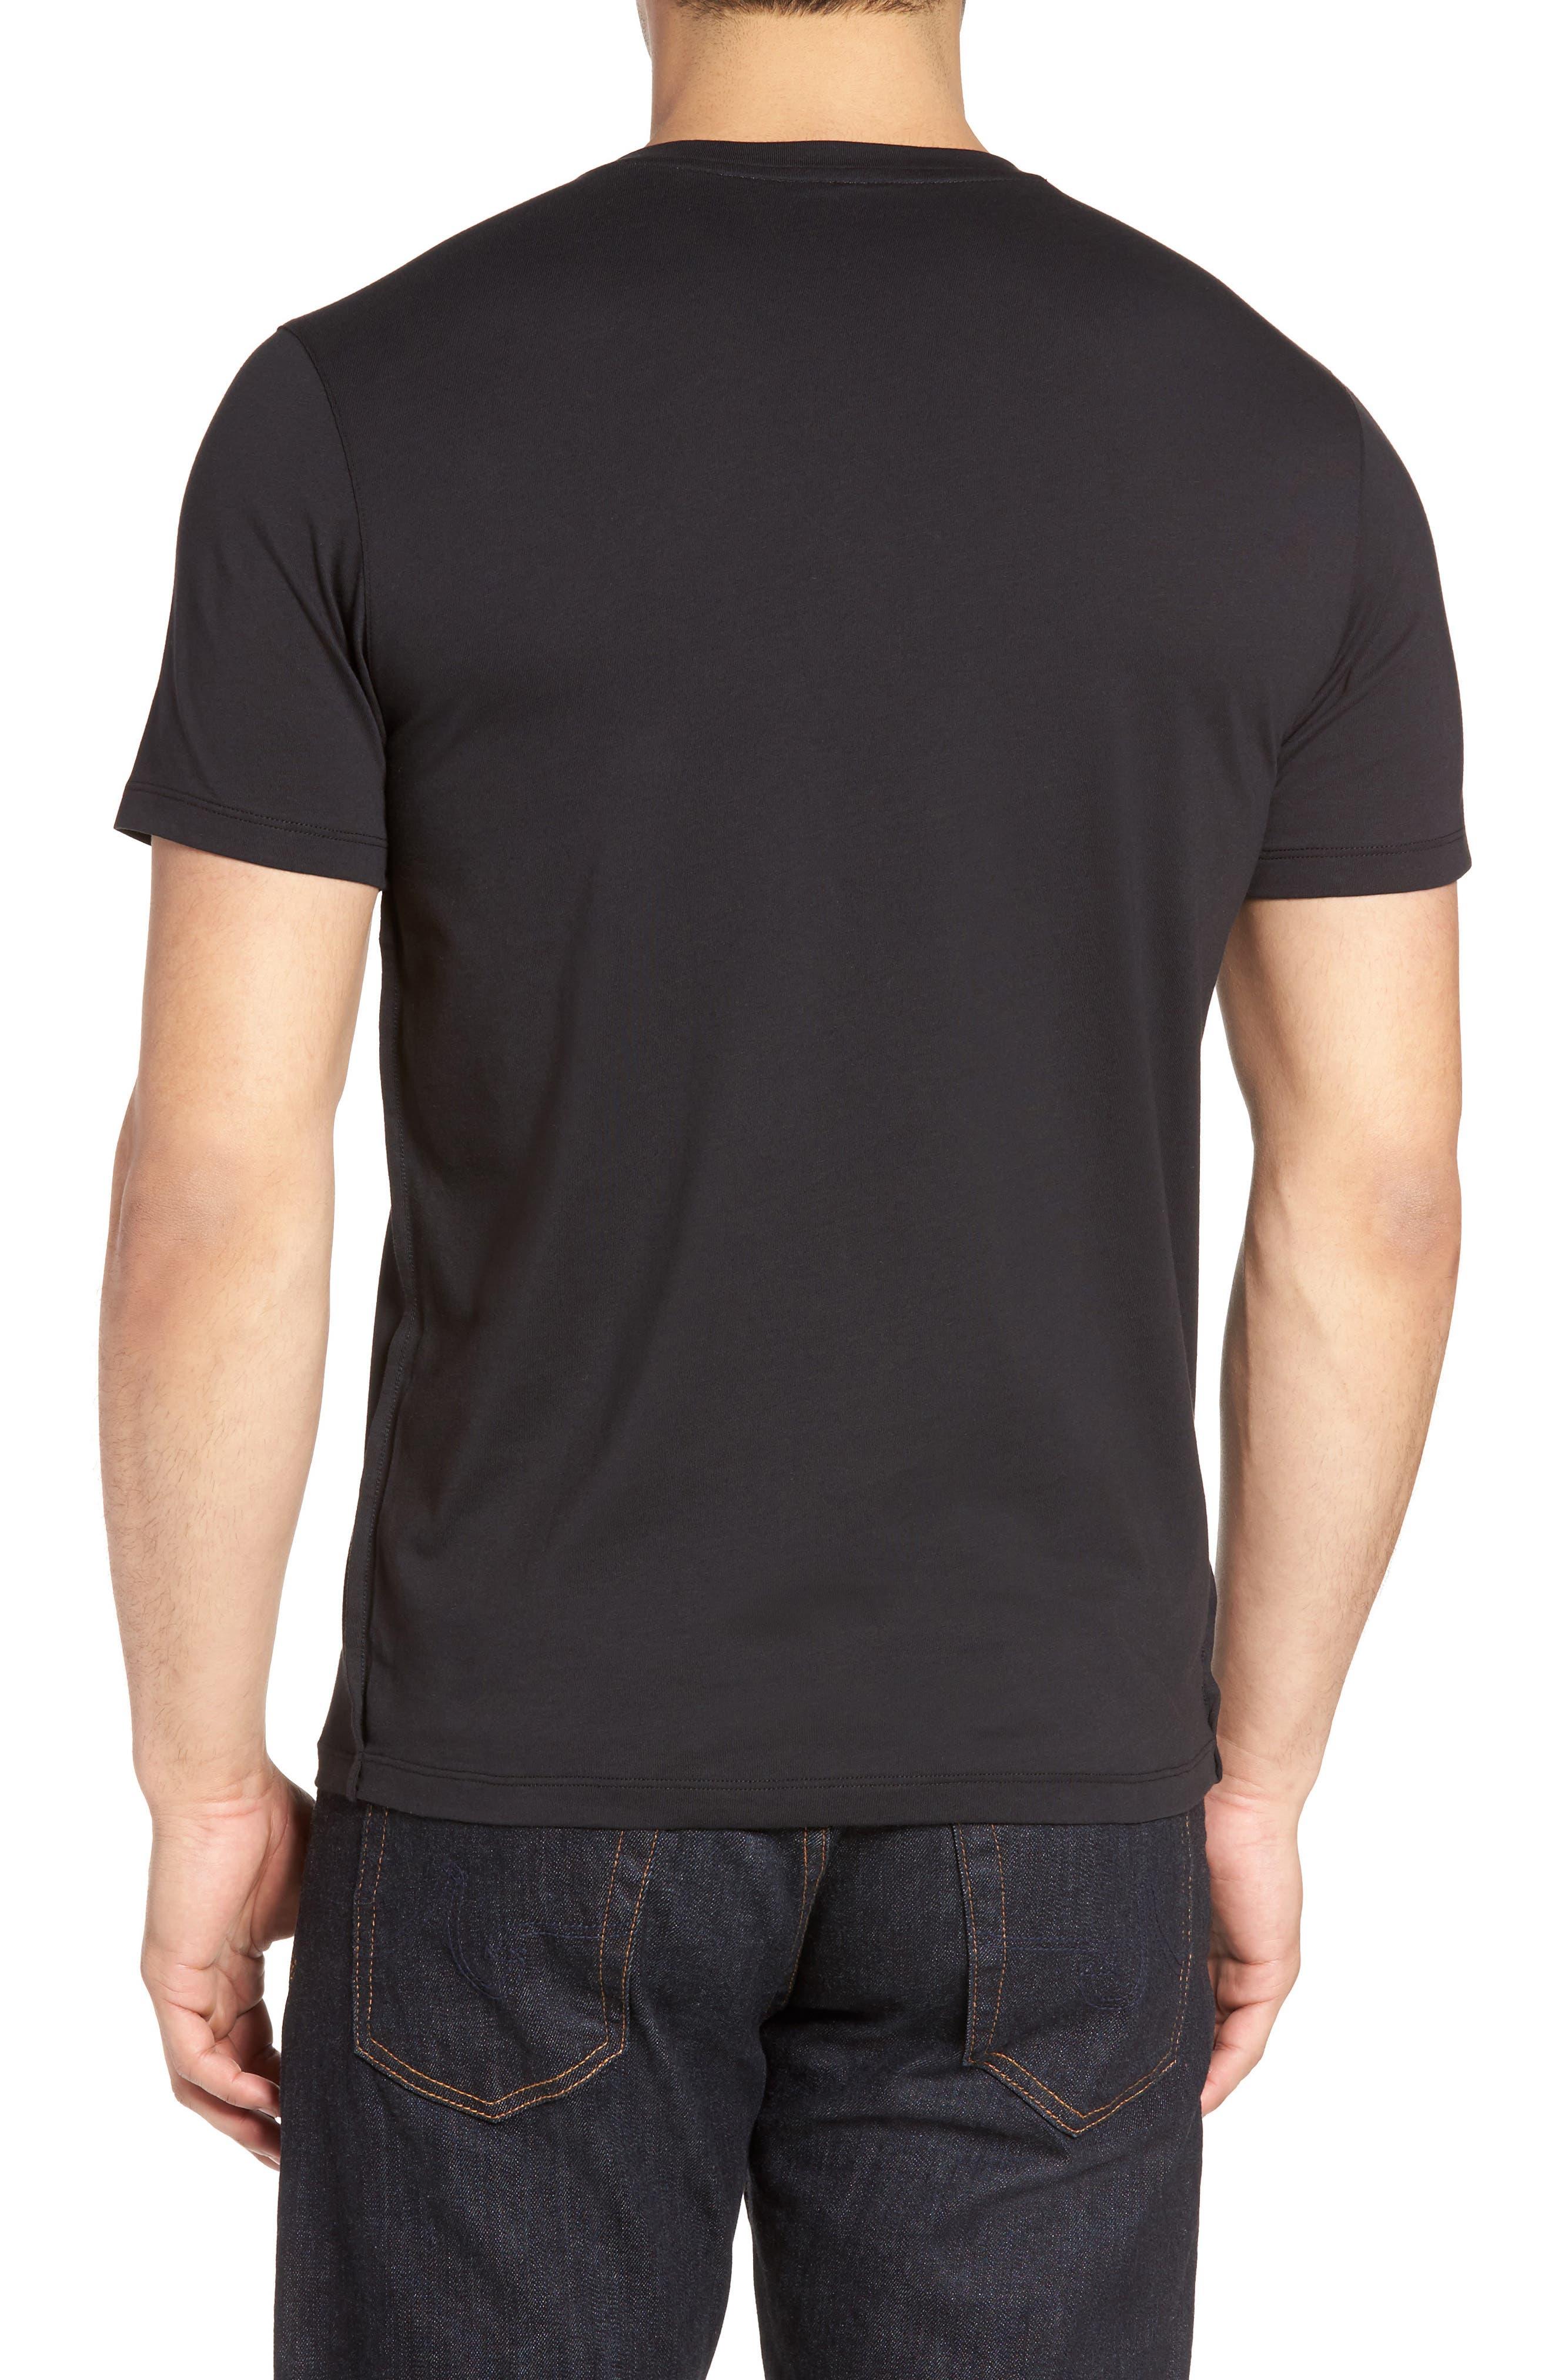 Alternate Image 2  - Zachary Prell Mercer Jersey T-Shirt